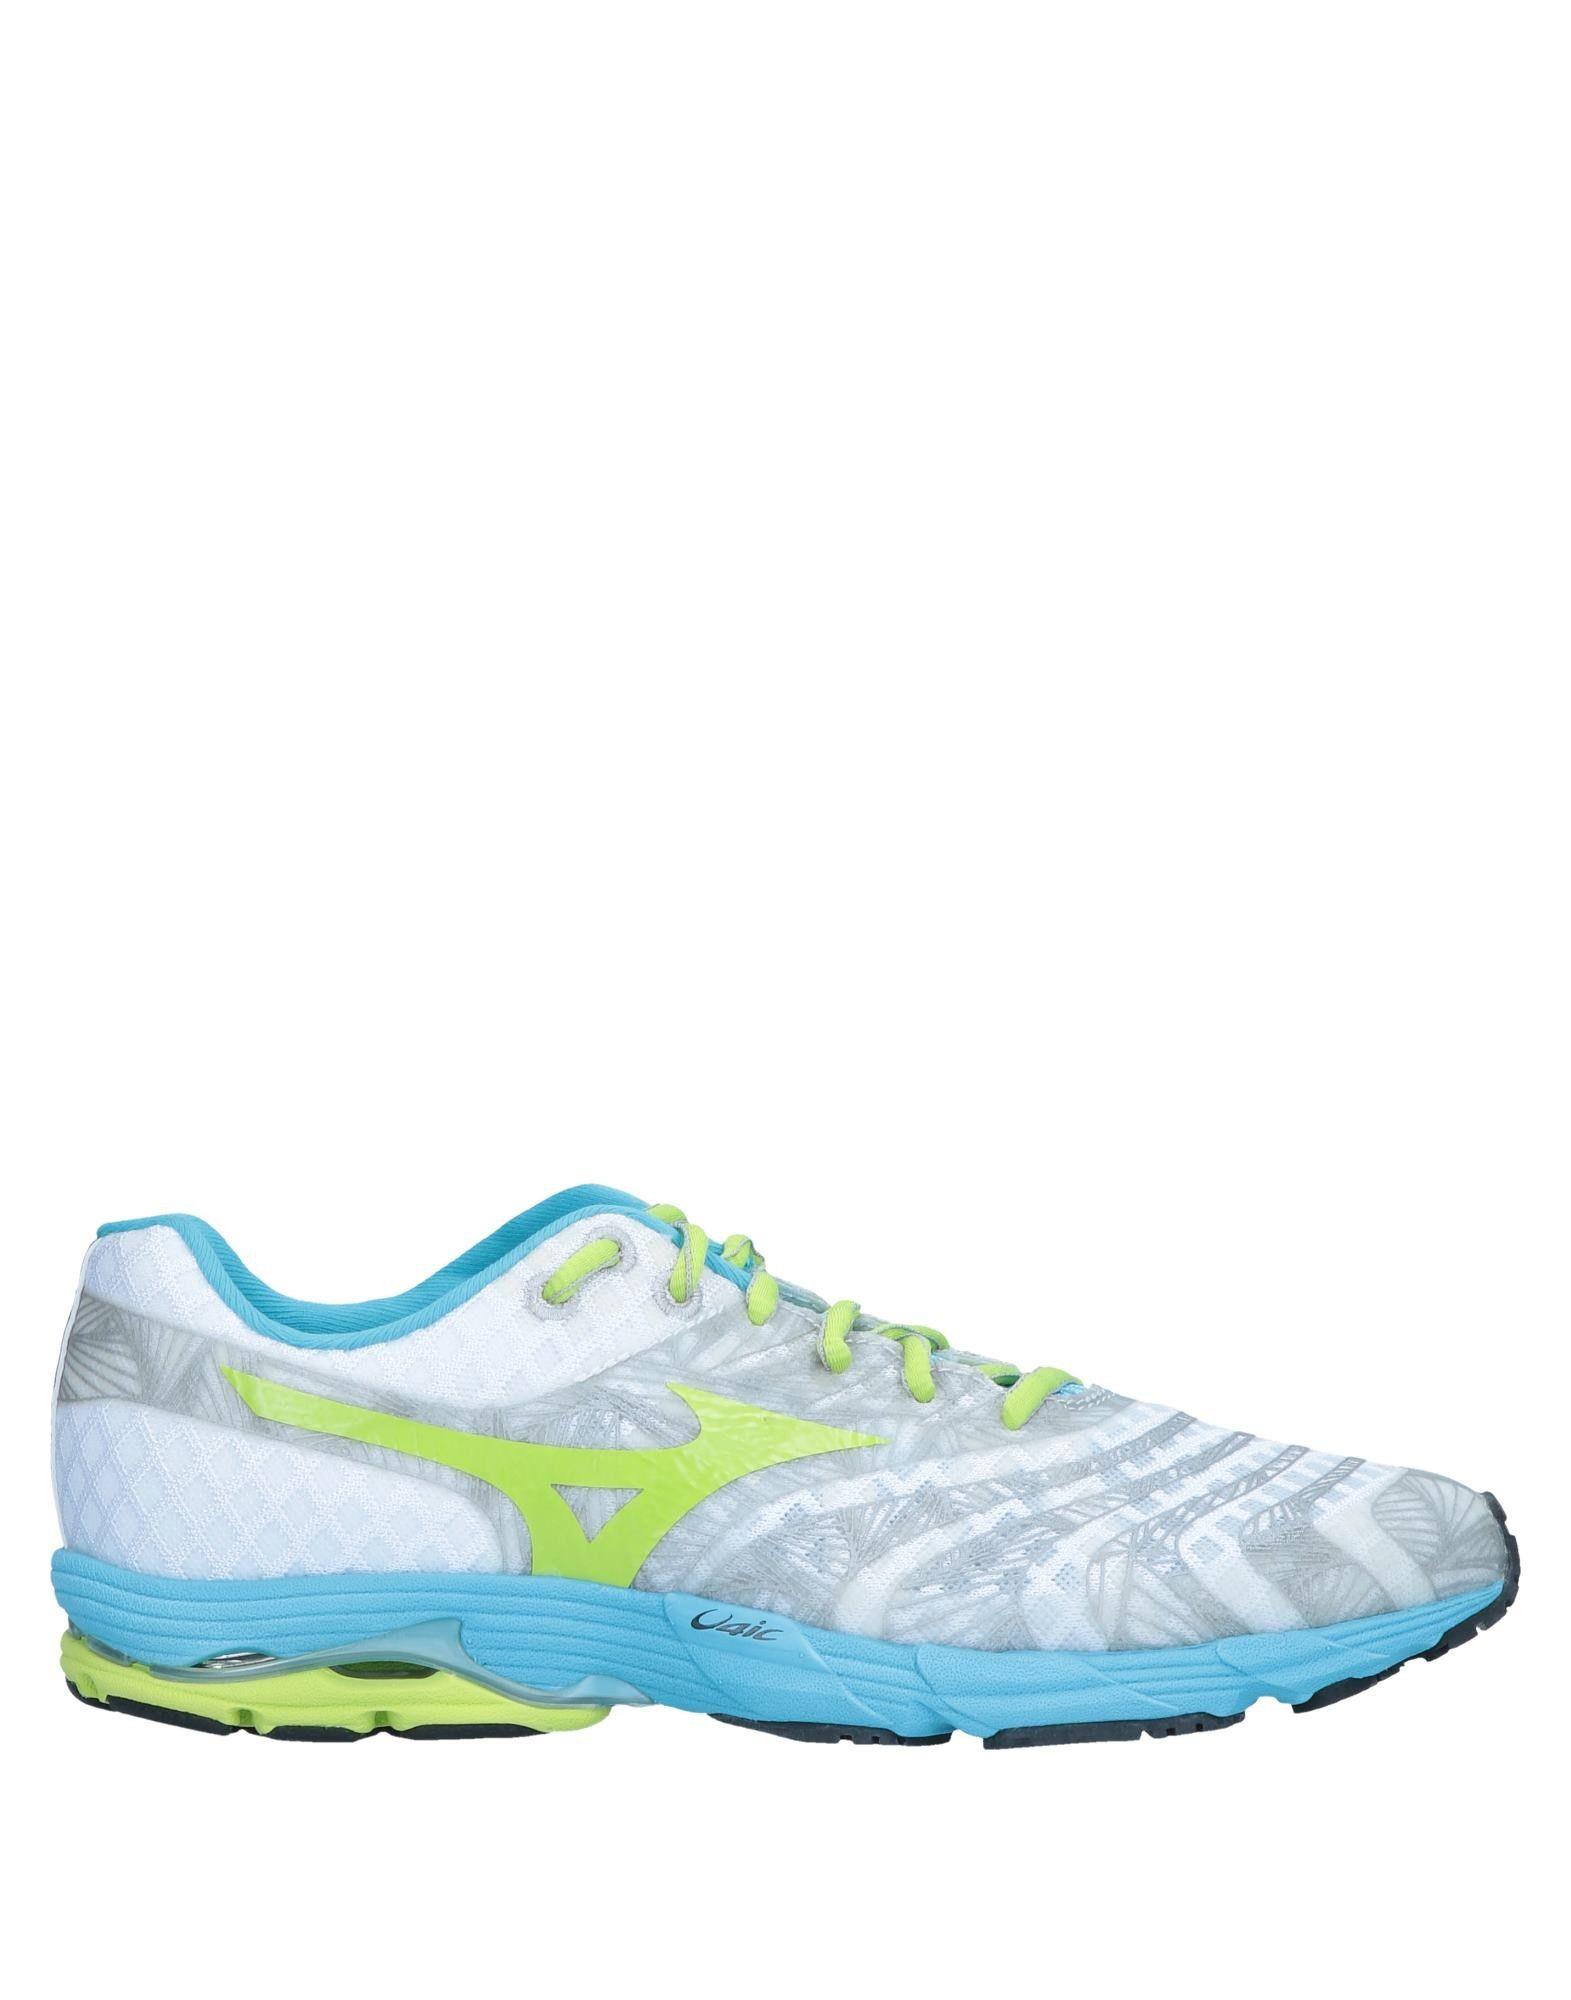 Mizuno Sneakers Damen  11546170DC Gute Qualität beliebte Schuhe